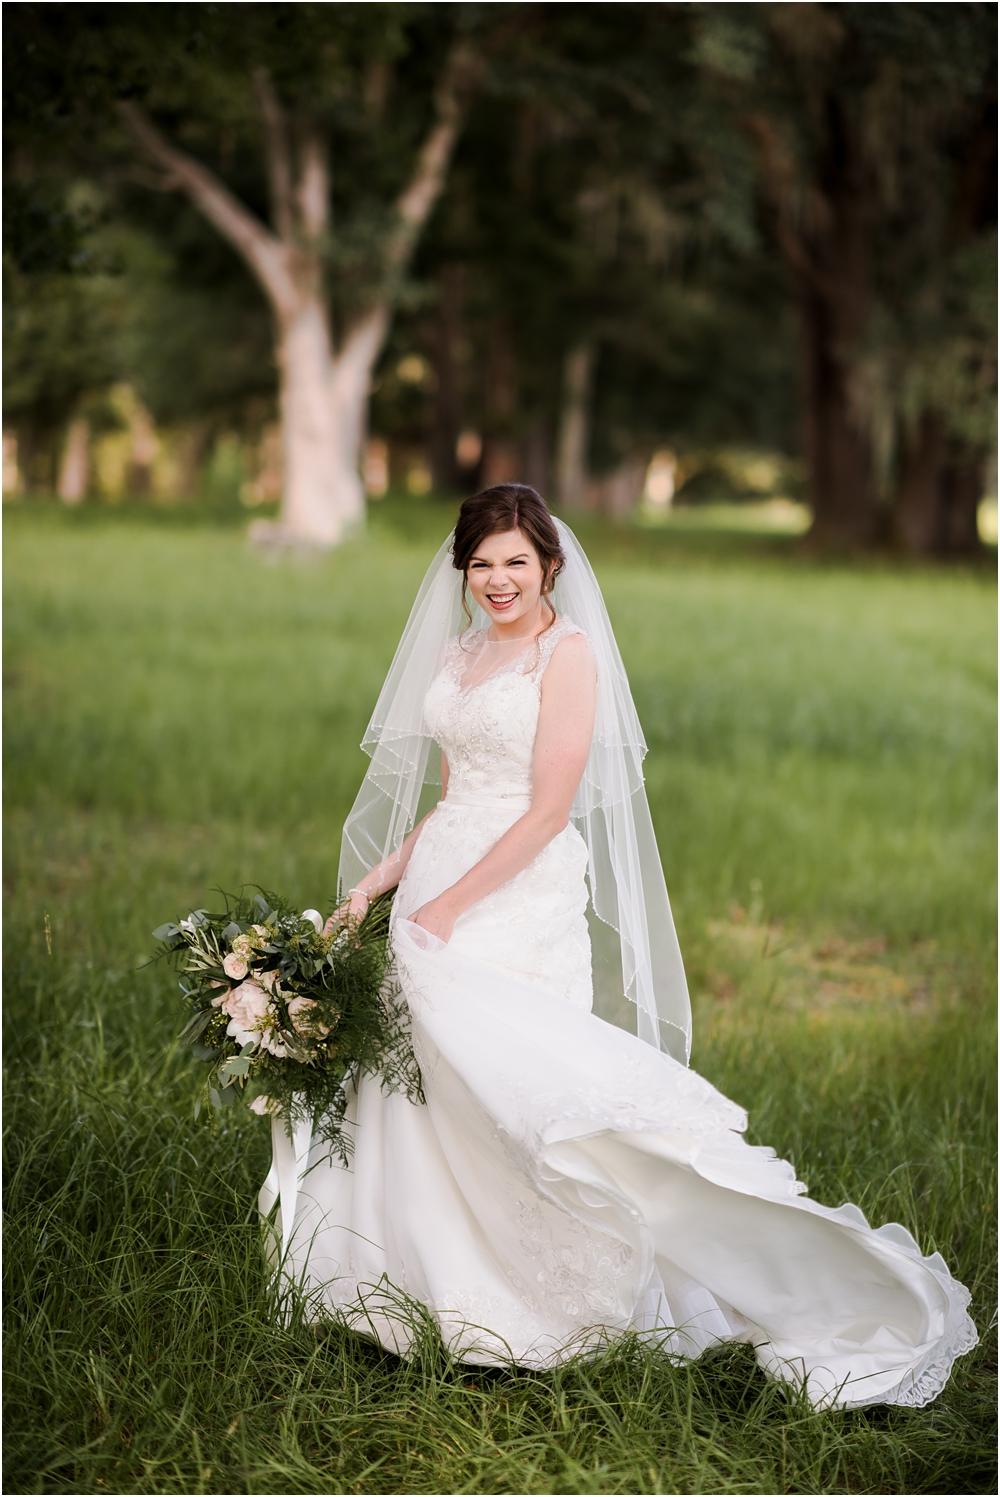 marianna-florida-wedding-photographer-kiersten-grant-37.jpg